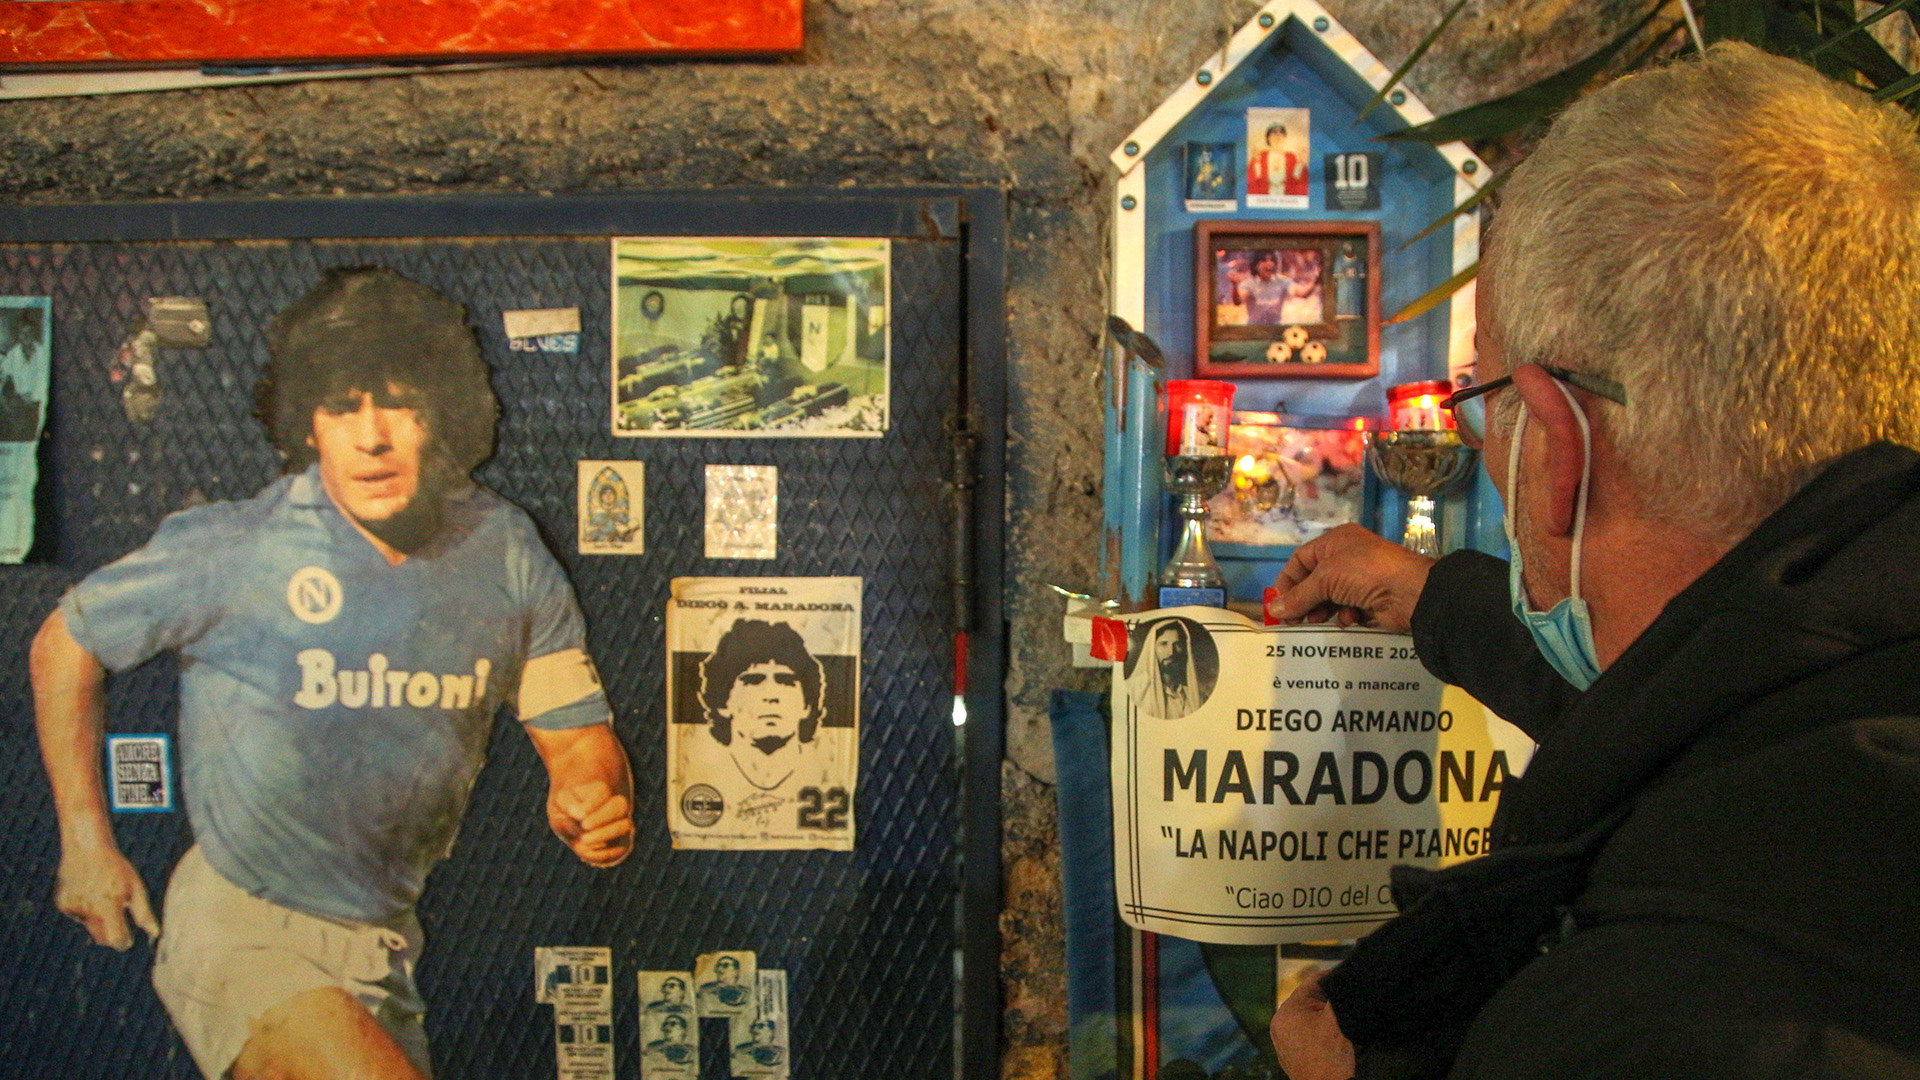 Diego Armando Maradona stadium: Napoli urged to rename San Paolo by city mayor